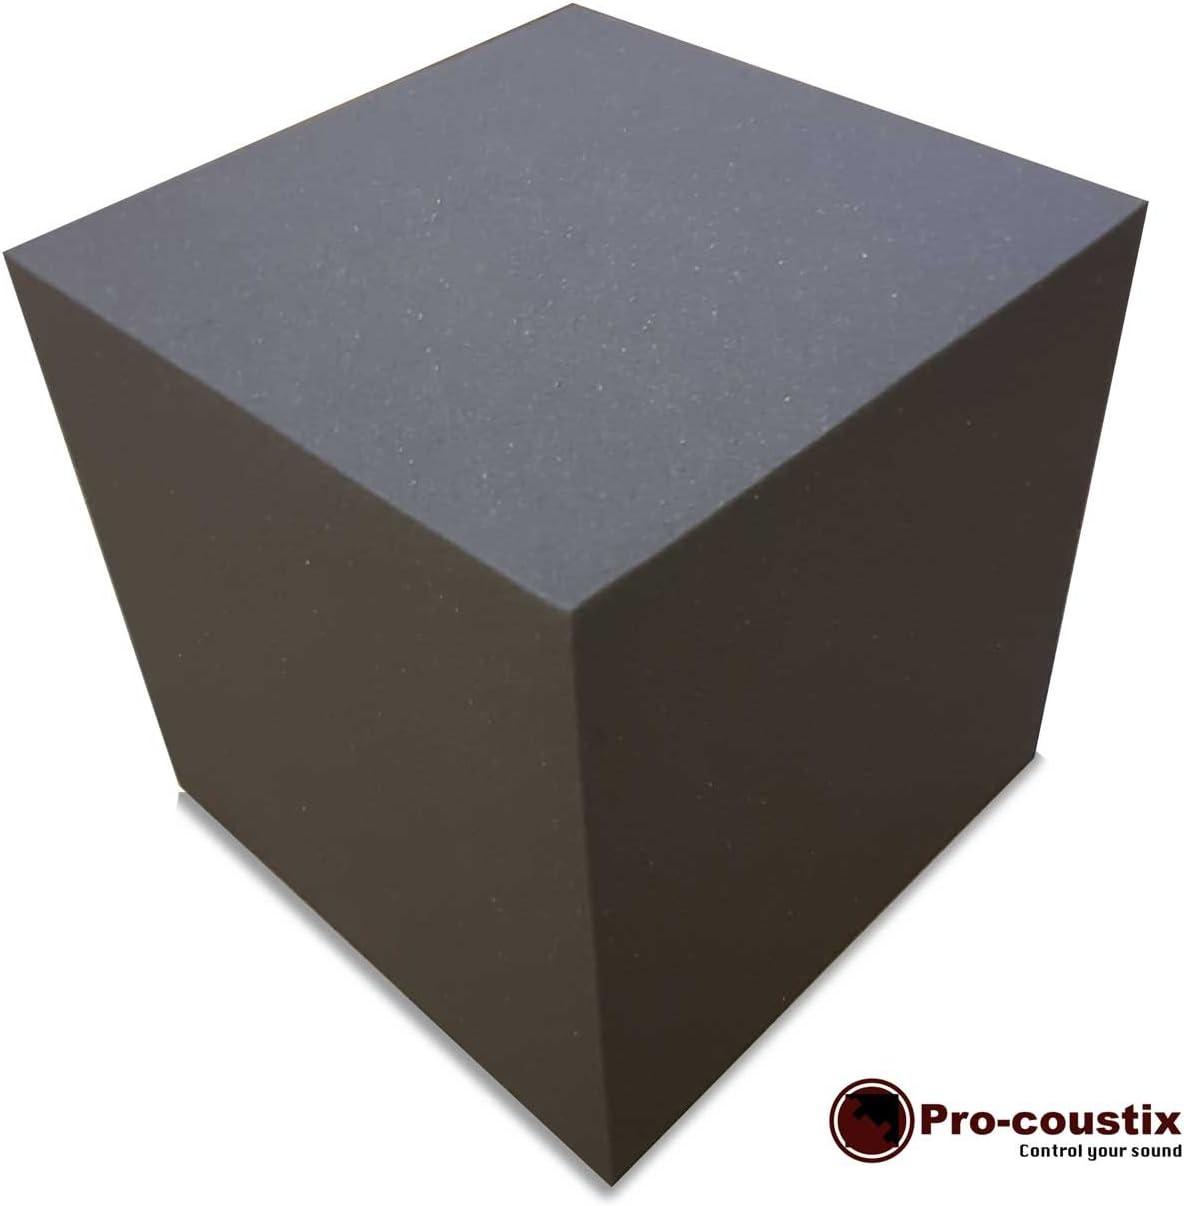 2x Corner Cube Pro-coustix Ultraflex Corner Kit Duo 6x 300Bass Traps